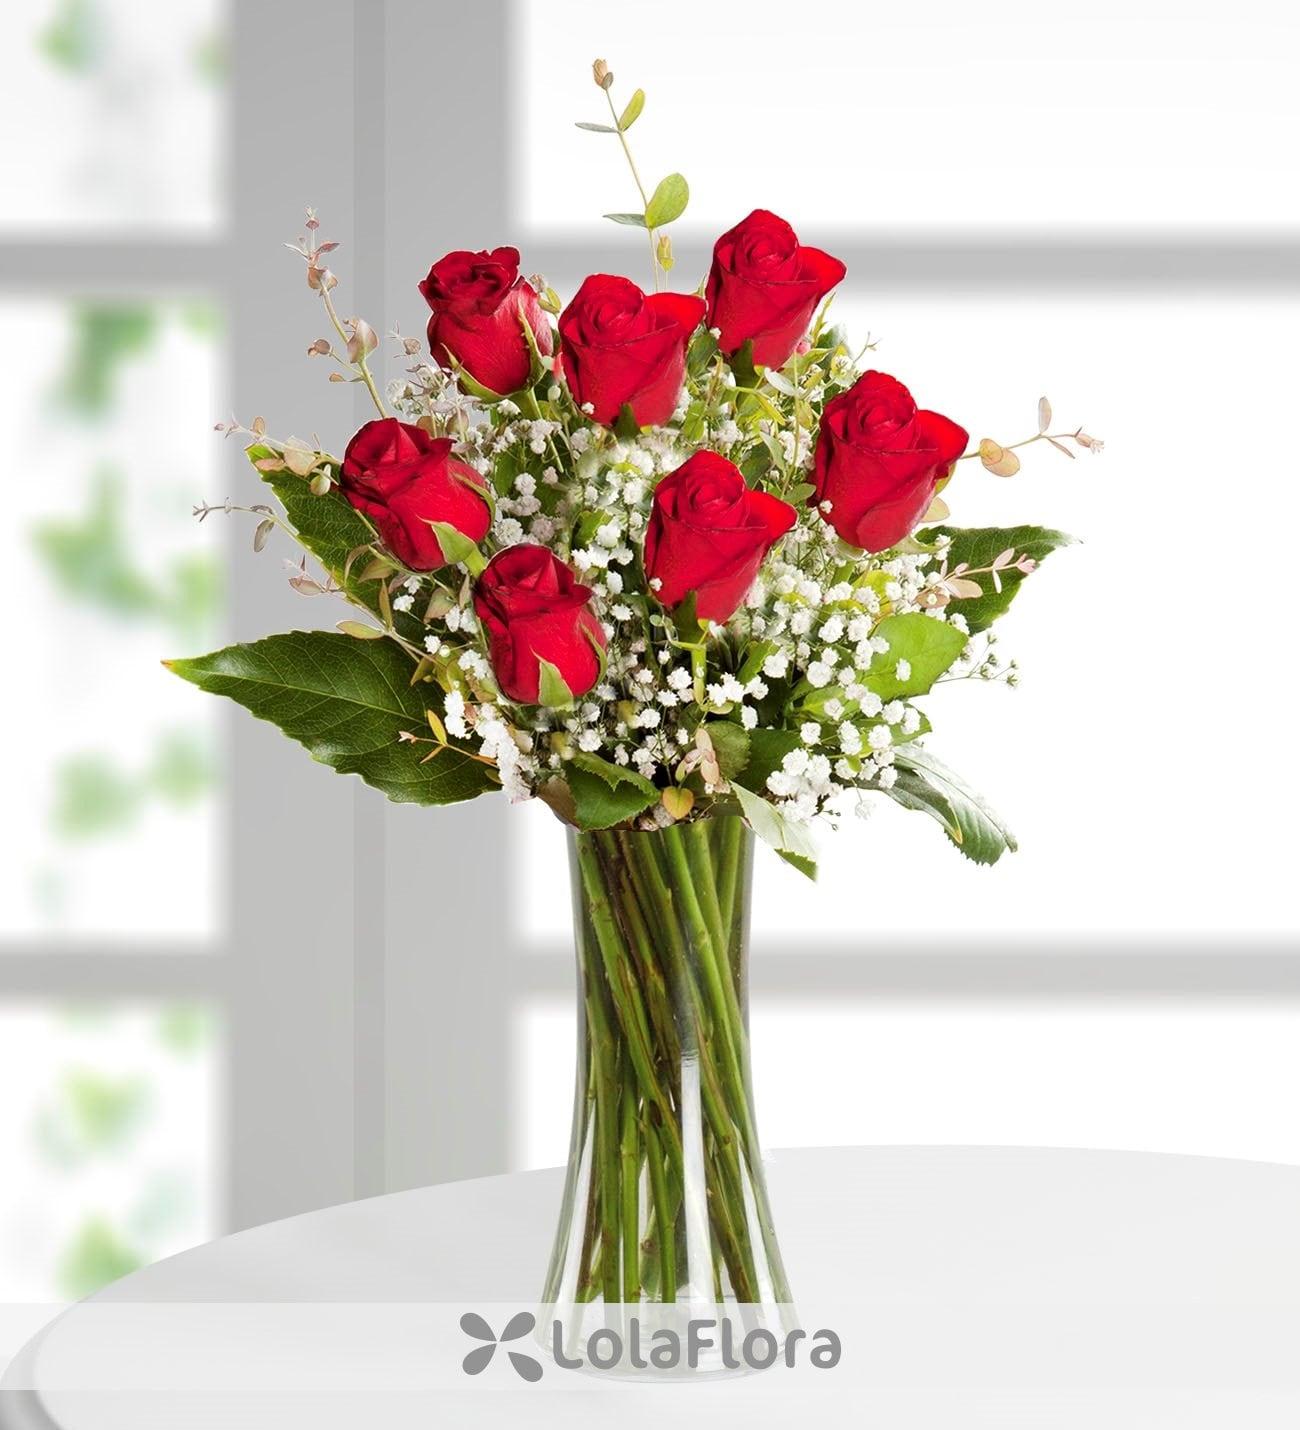 7 Rosas Rojas Amor Mágico Amor Perfecto Lolaflora